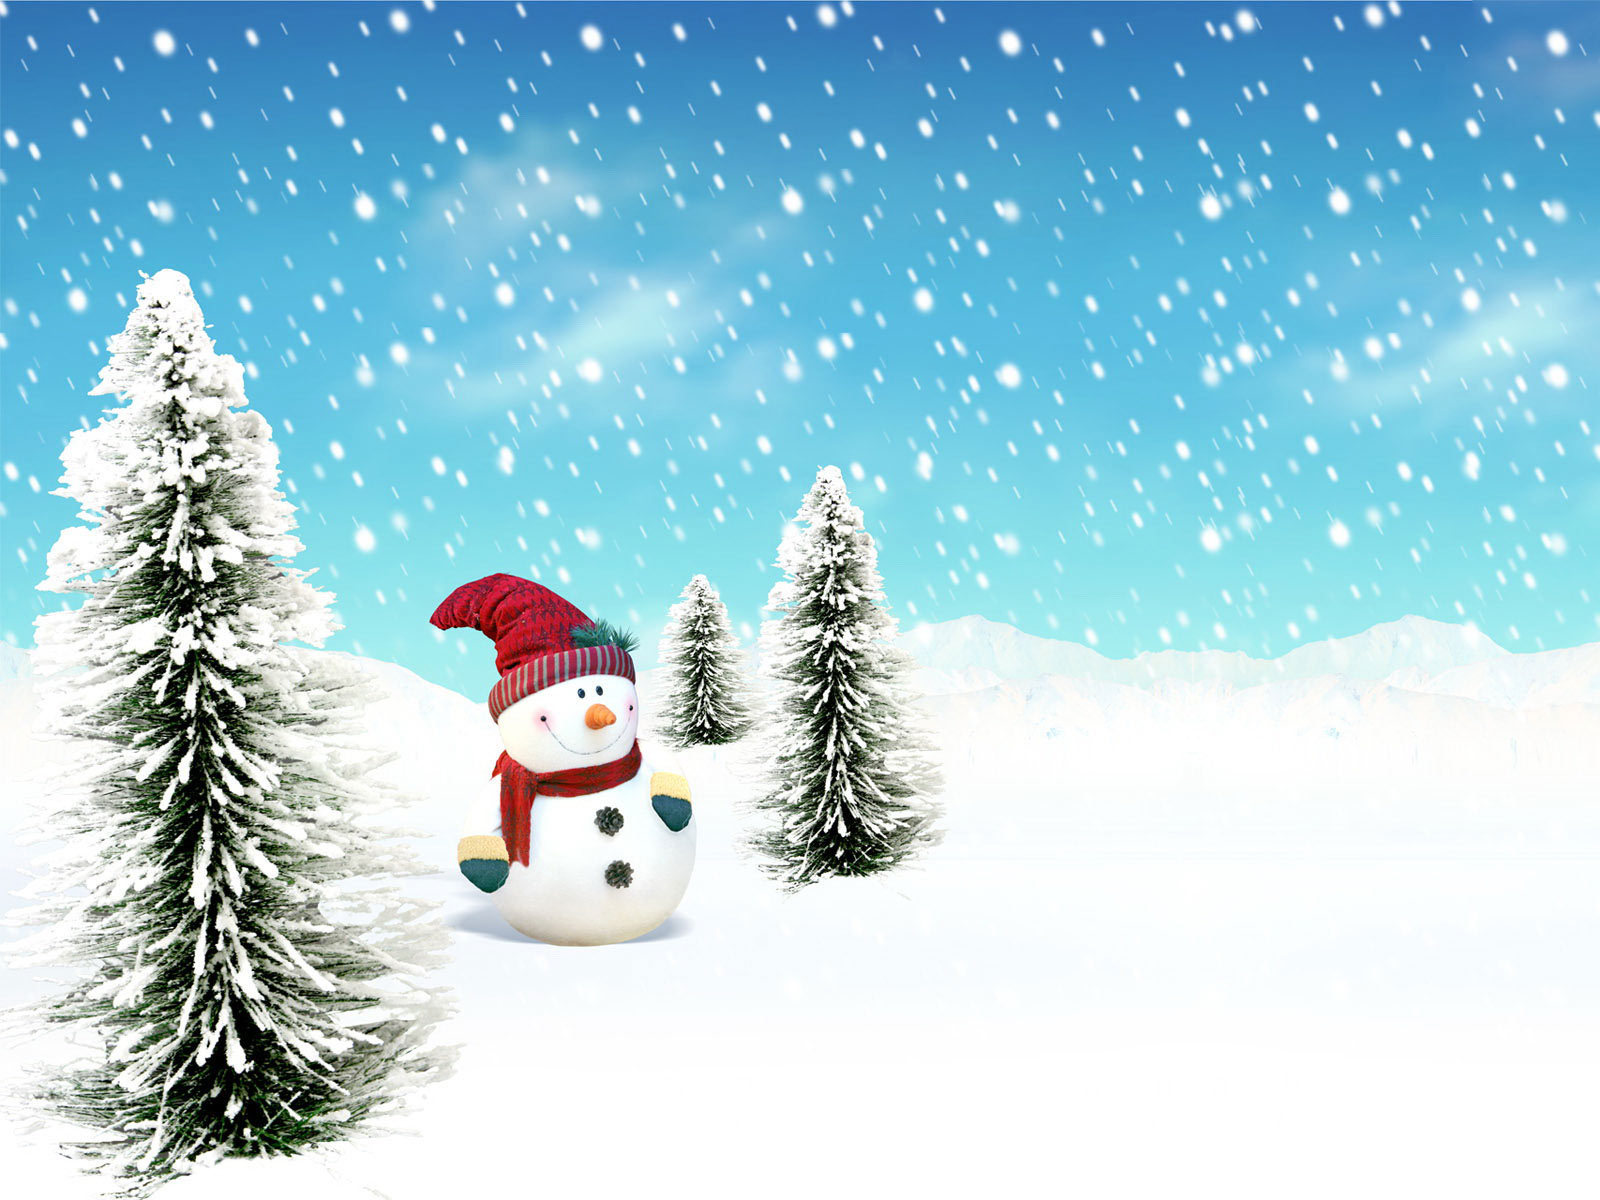 Snowman   Winter Photo 13347588 1600x1200